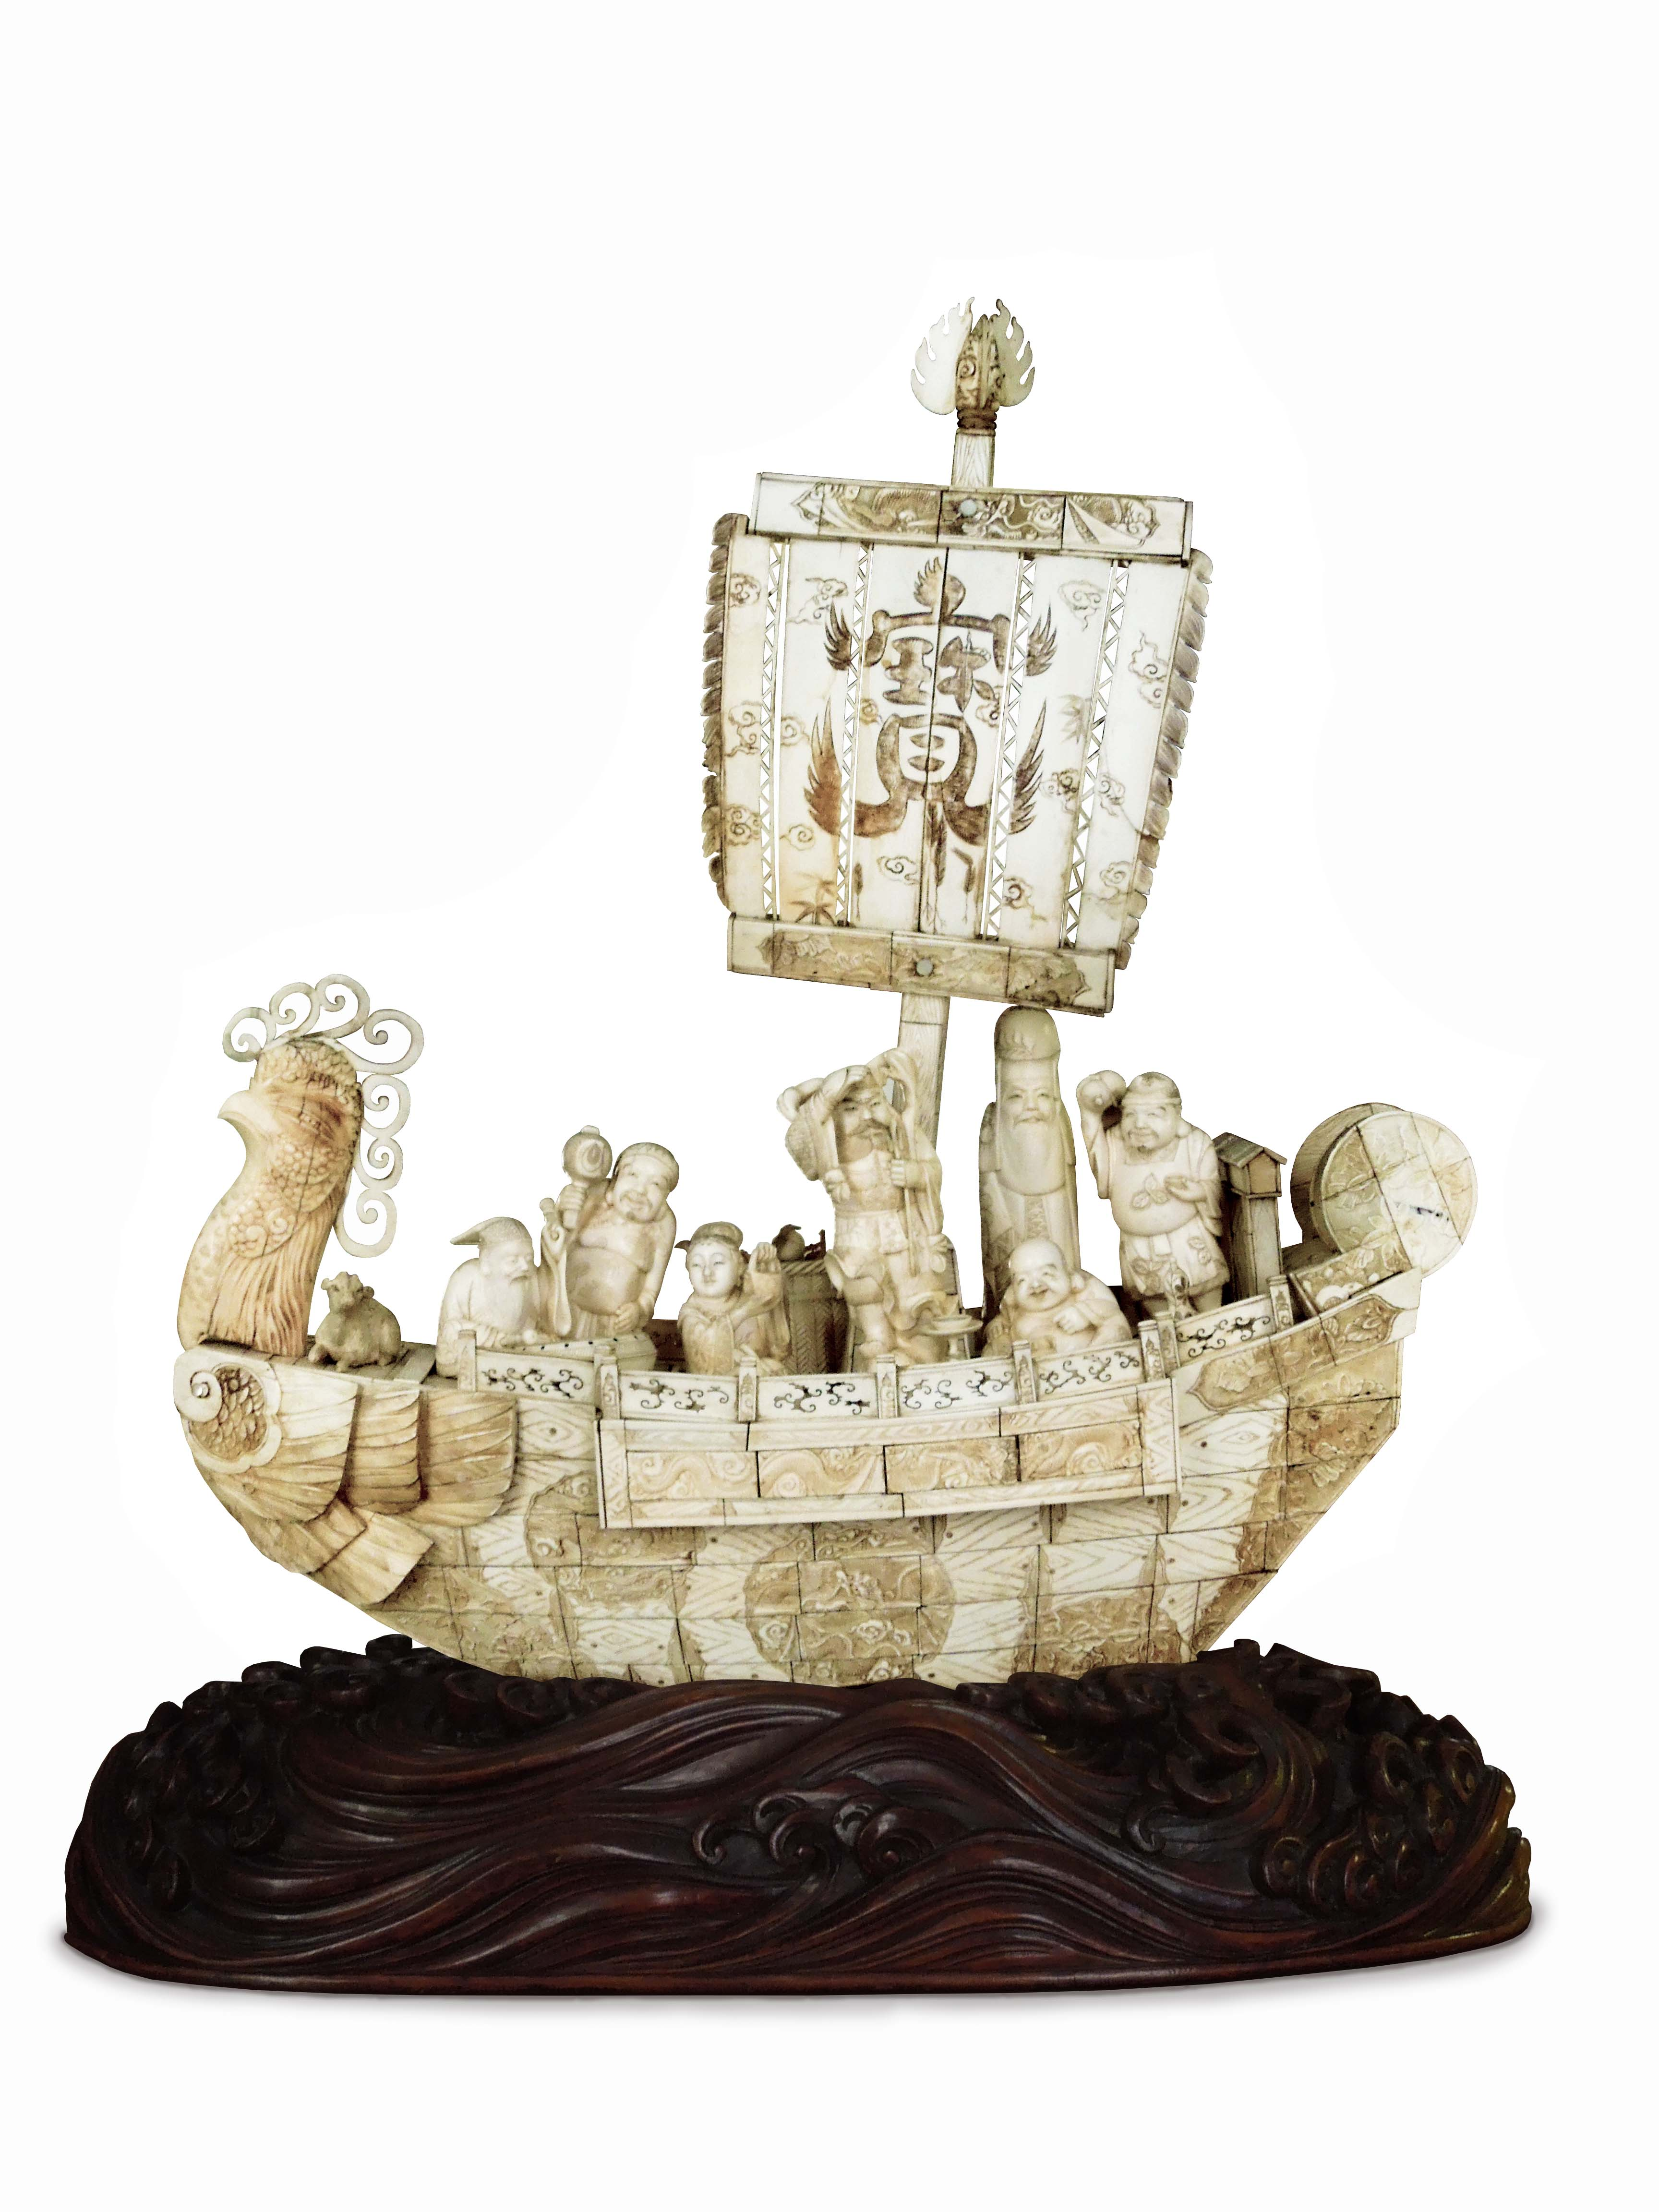 KATARABUNE, Loď pokladů